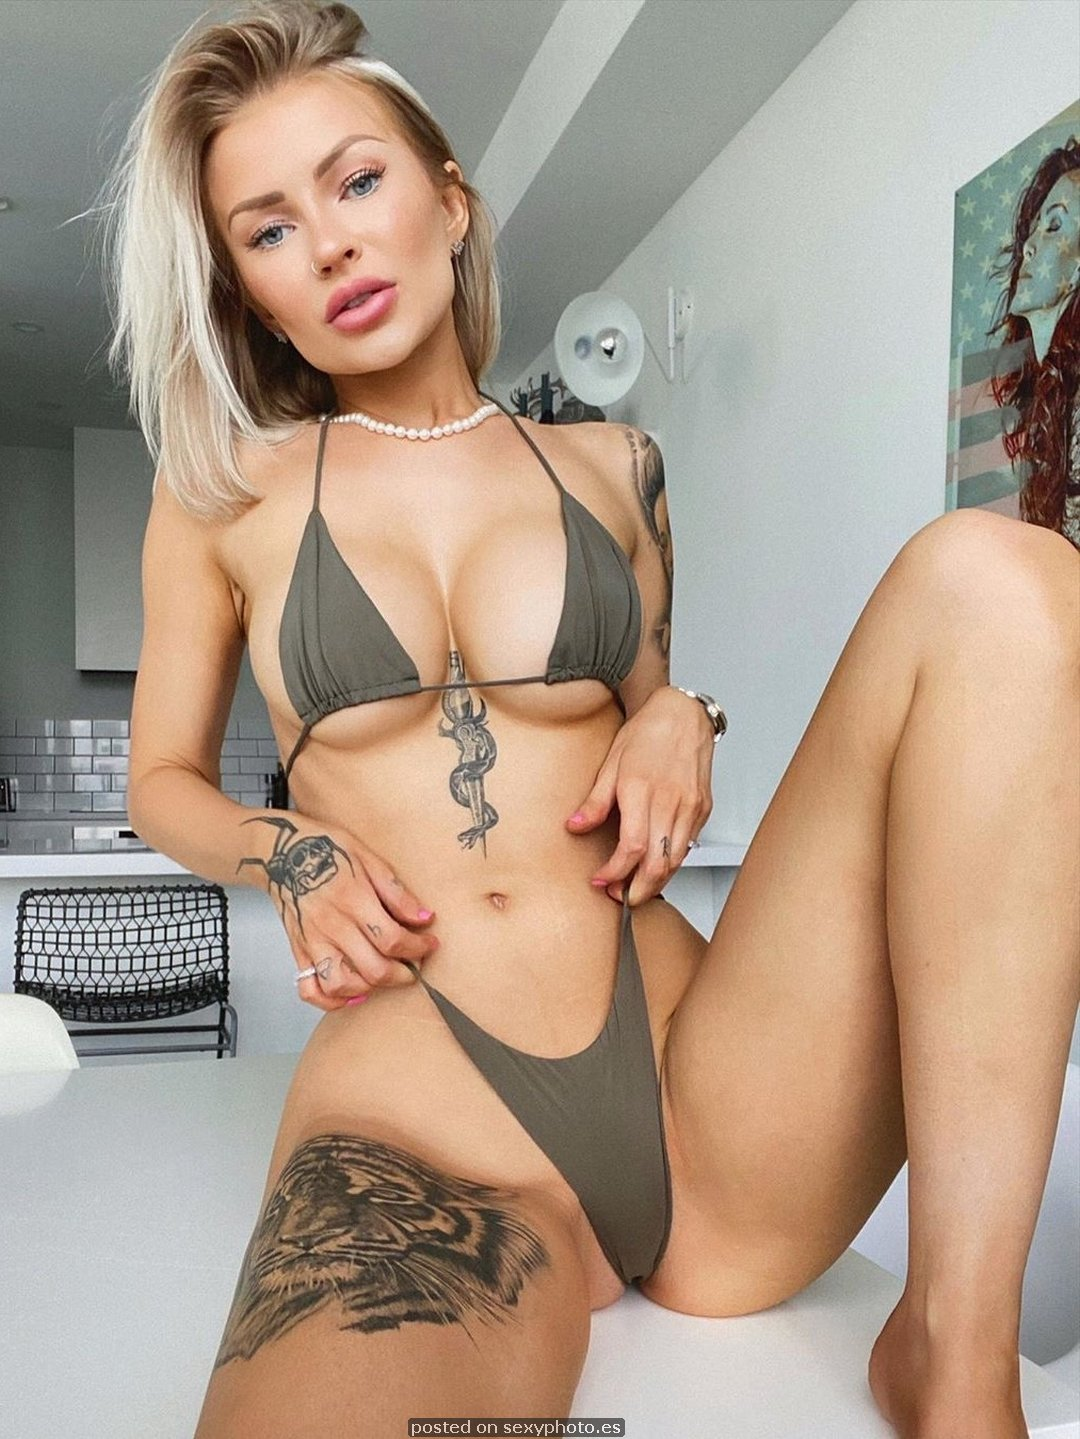 tatto girl underboobs bikini